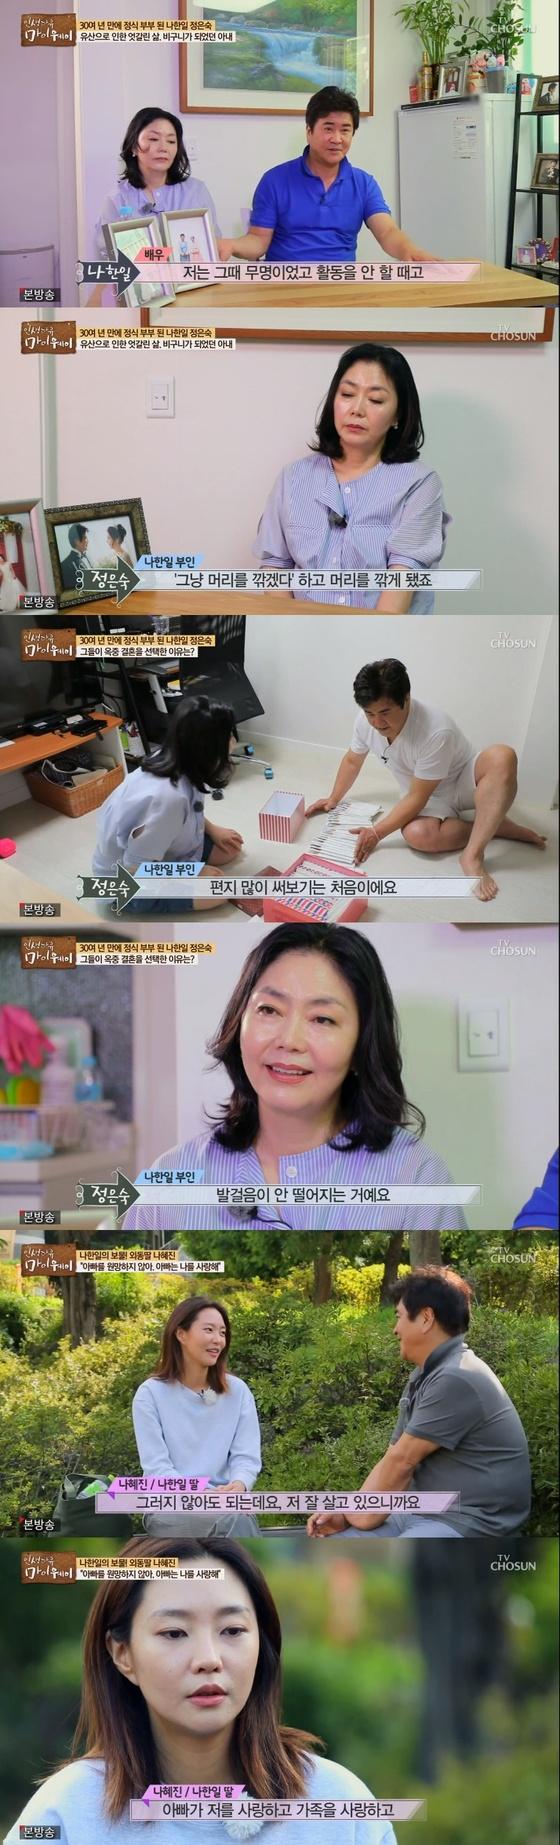 [RE:TV]'마이웨이' 나한일, 직접 밝힌 10년 공백…수감생활 그리고 재혼